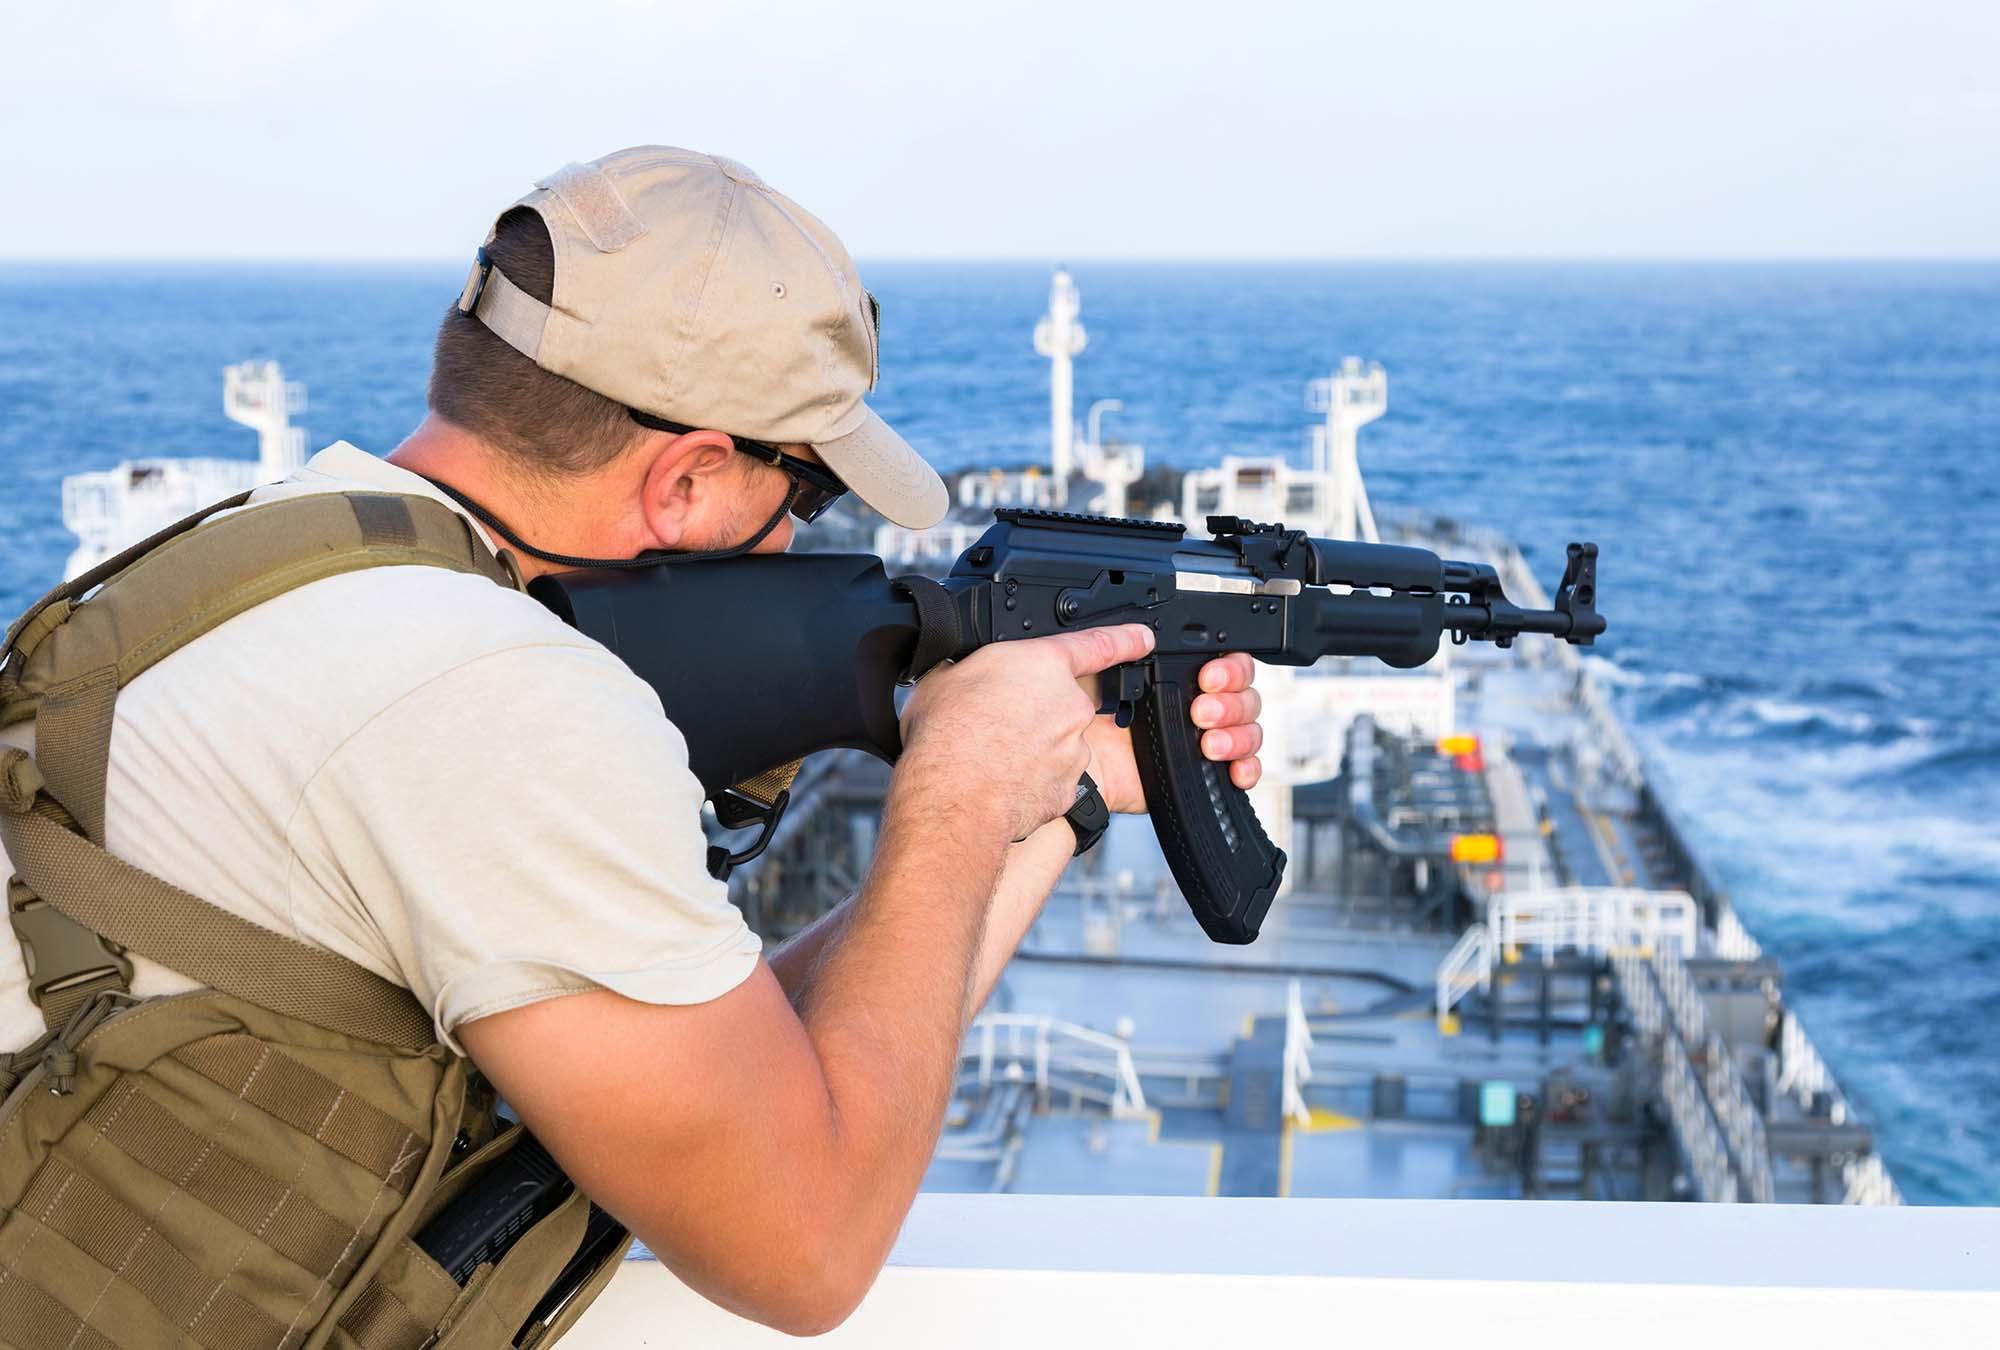 Piracy Publications